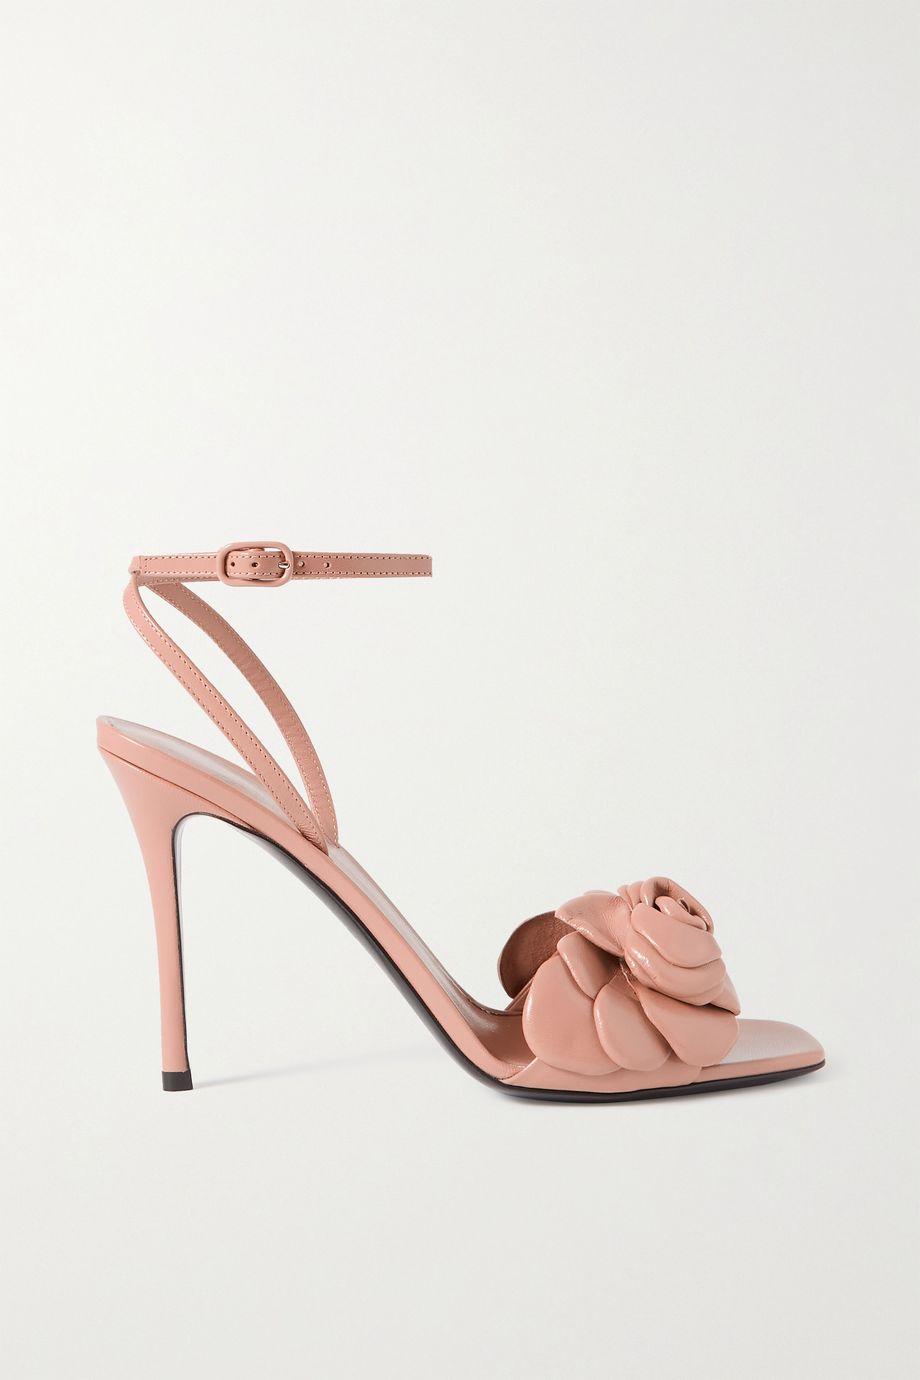 Valentino Valentino Garavani Rosa 100 appliquéd leather sandals